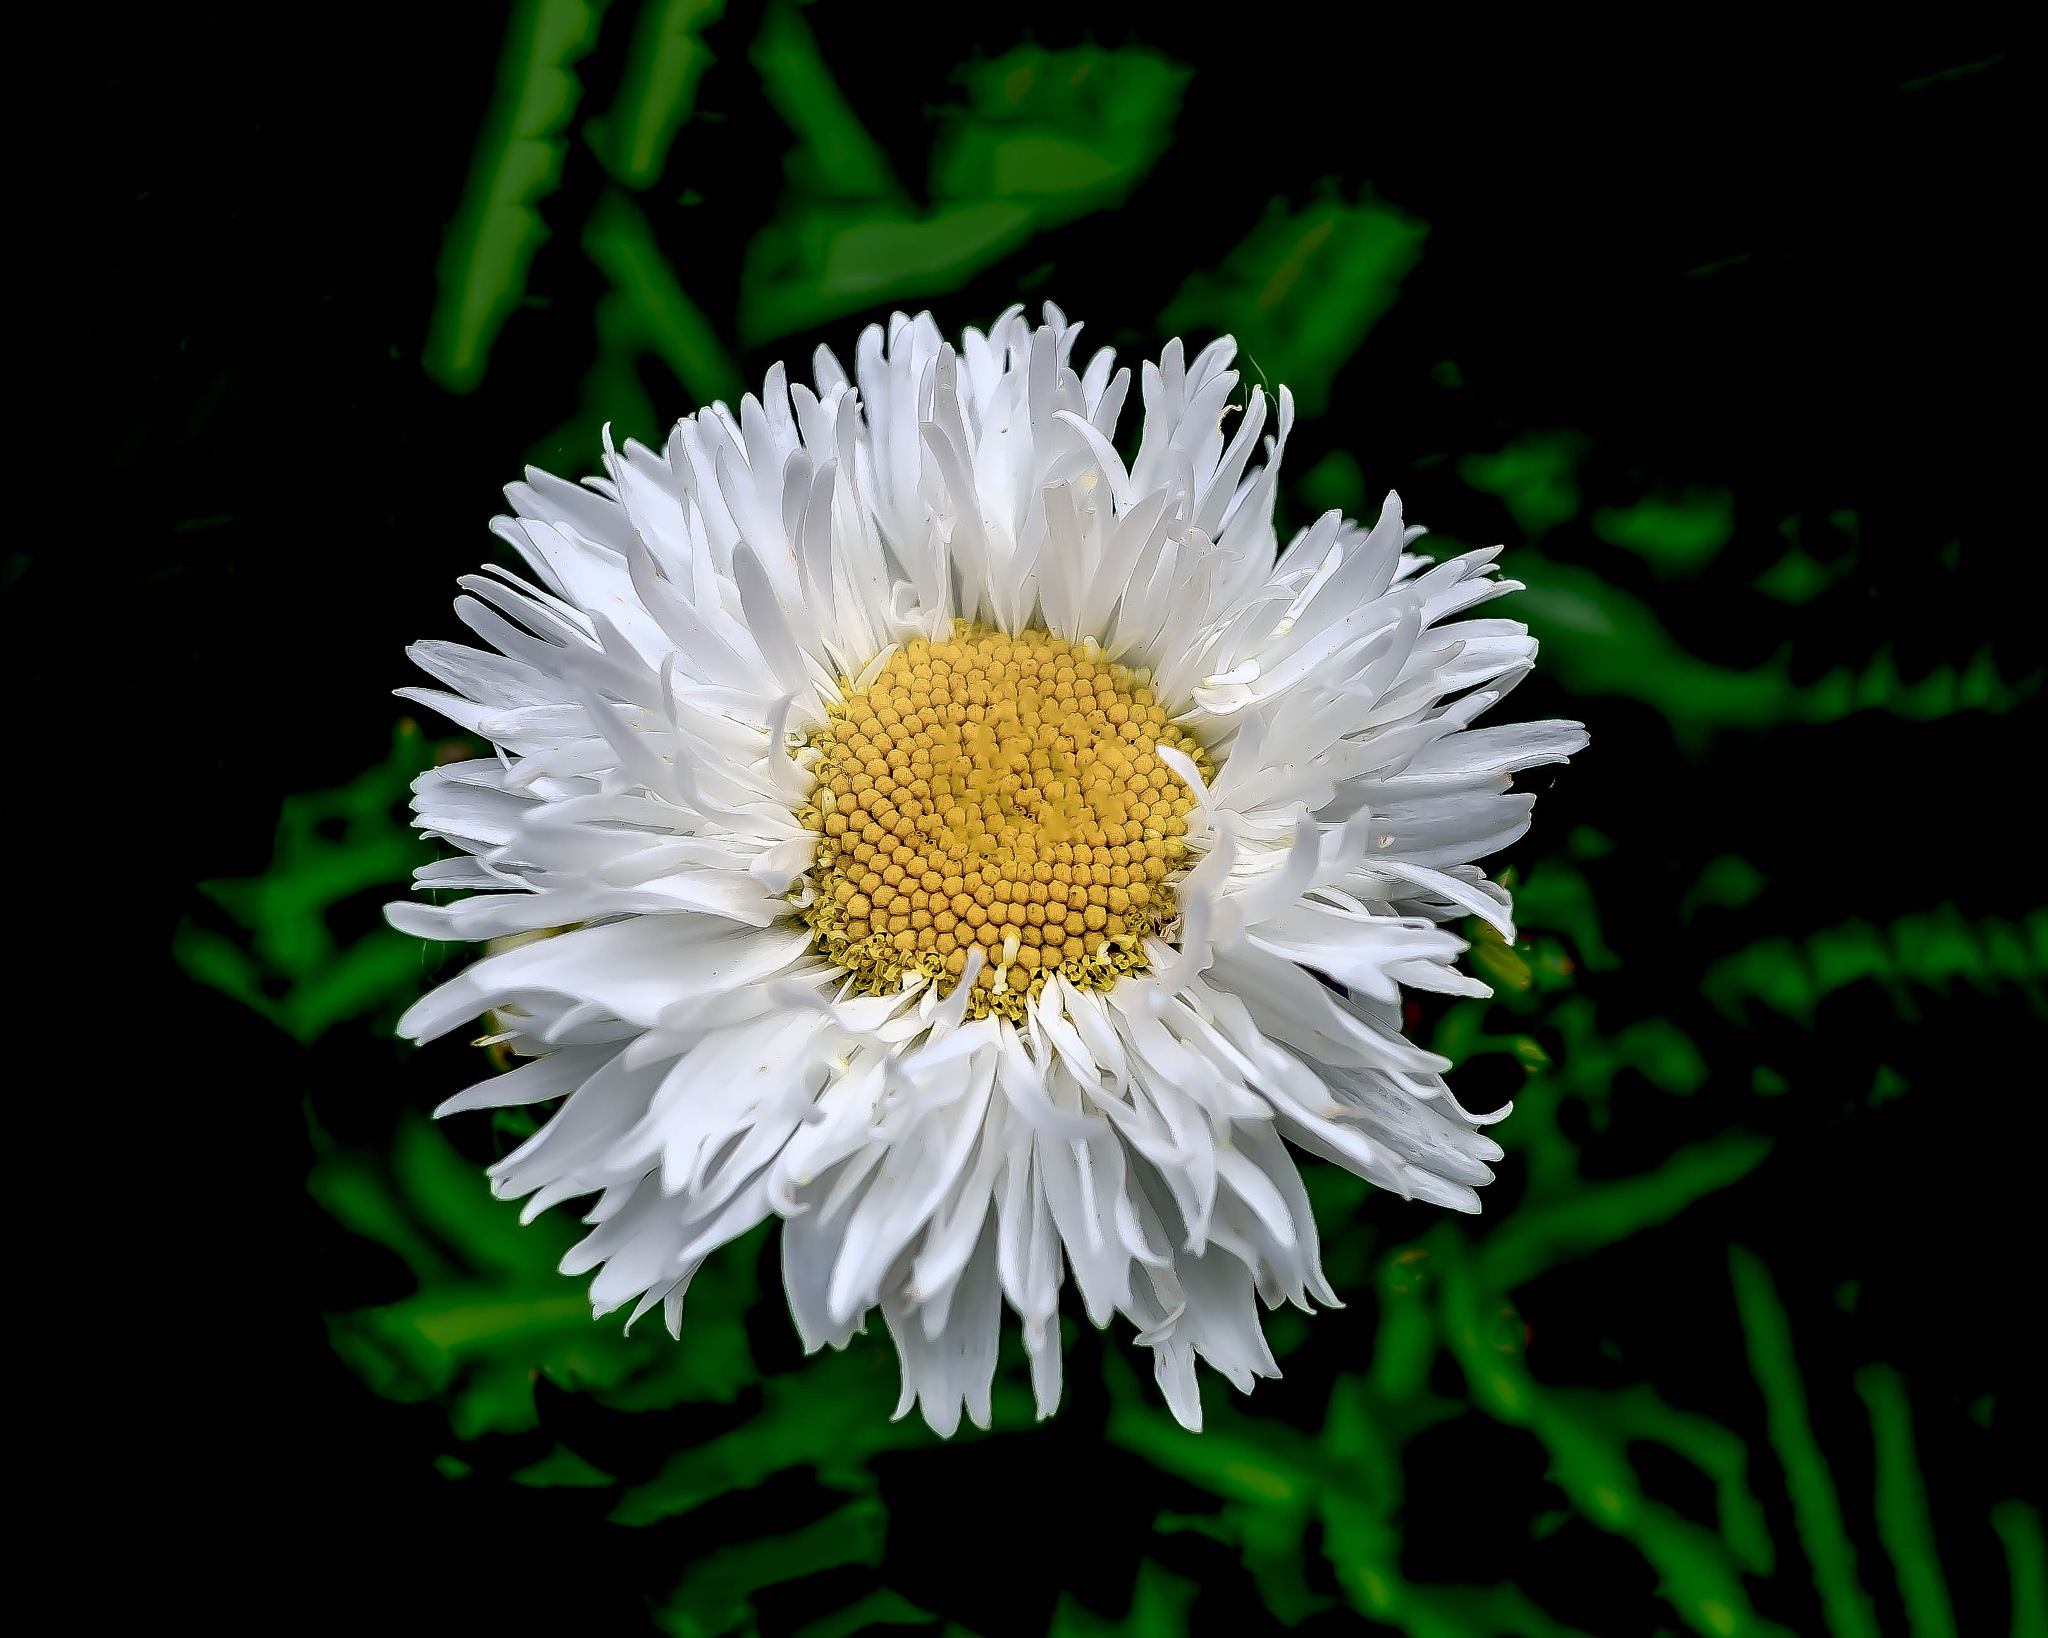 Shreaded Daisy by Edward Brown